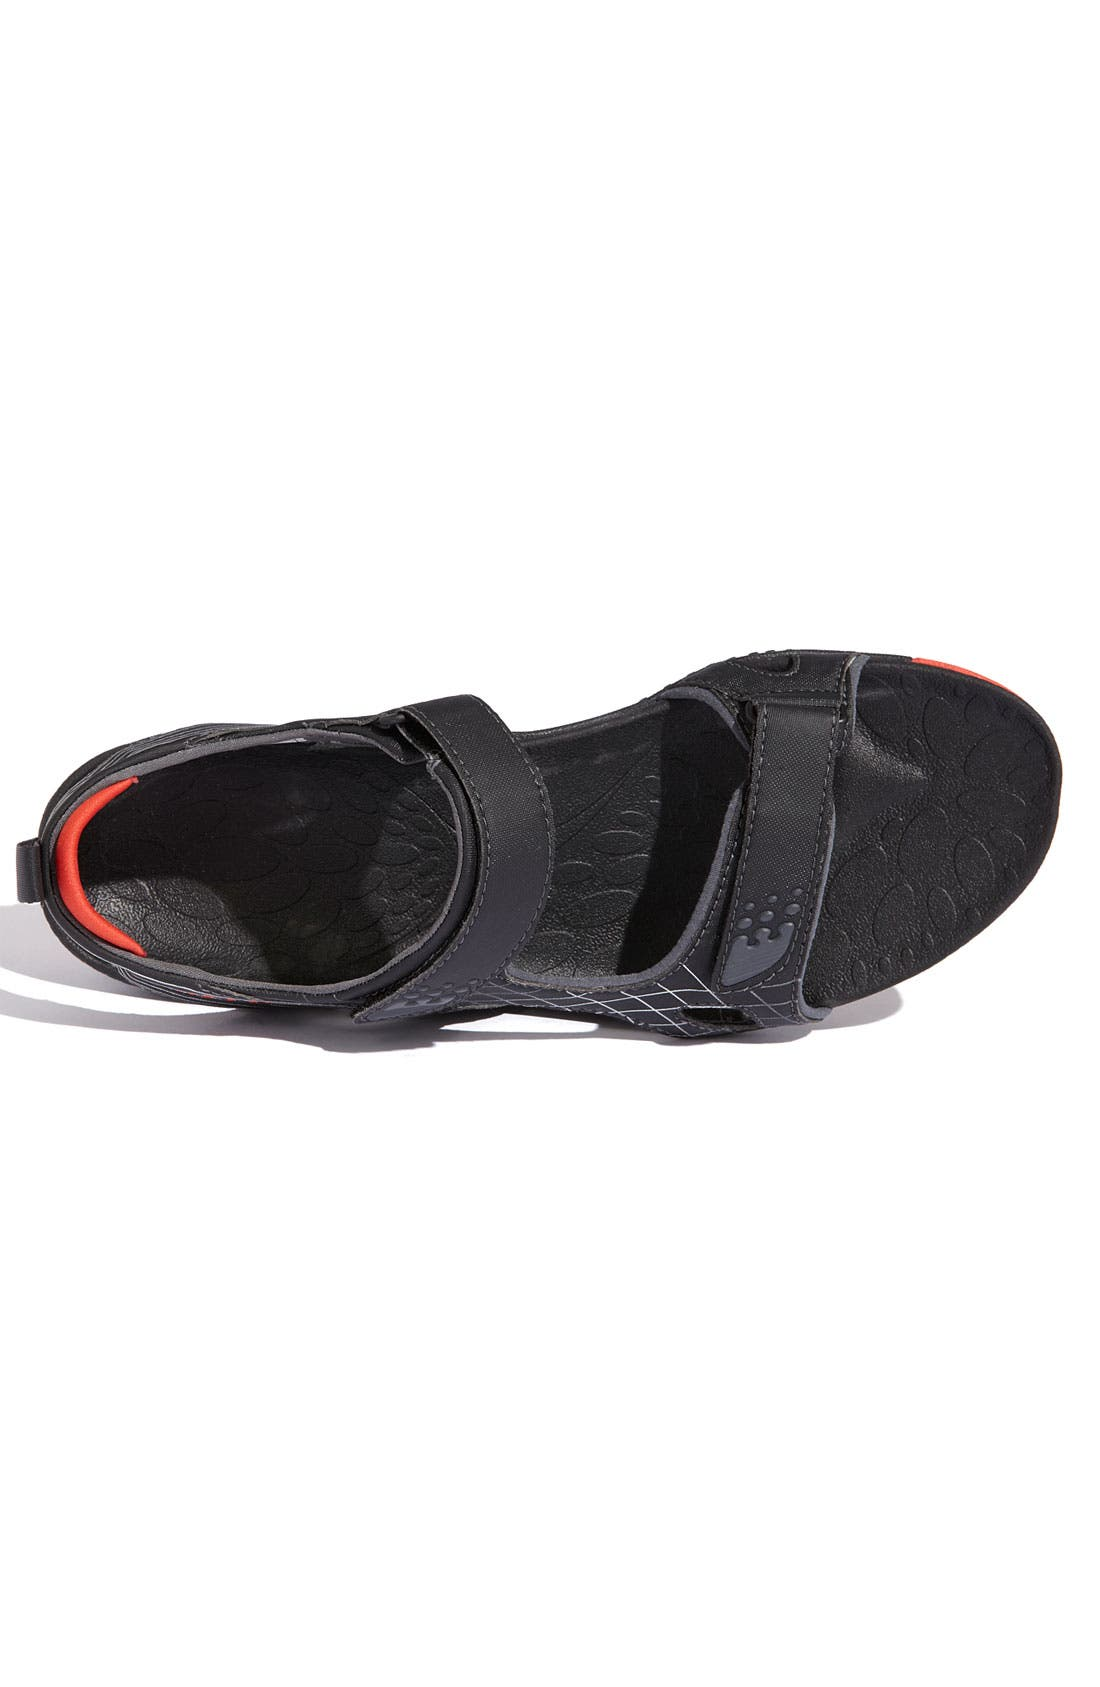 Alternate Image 3  - Merrell 'Aqua Wrap' Water Sandal